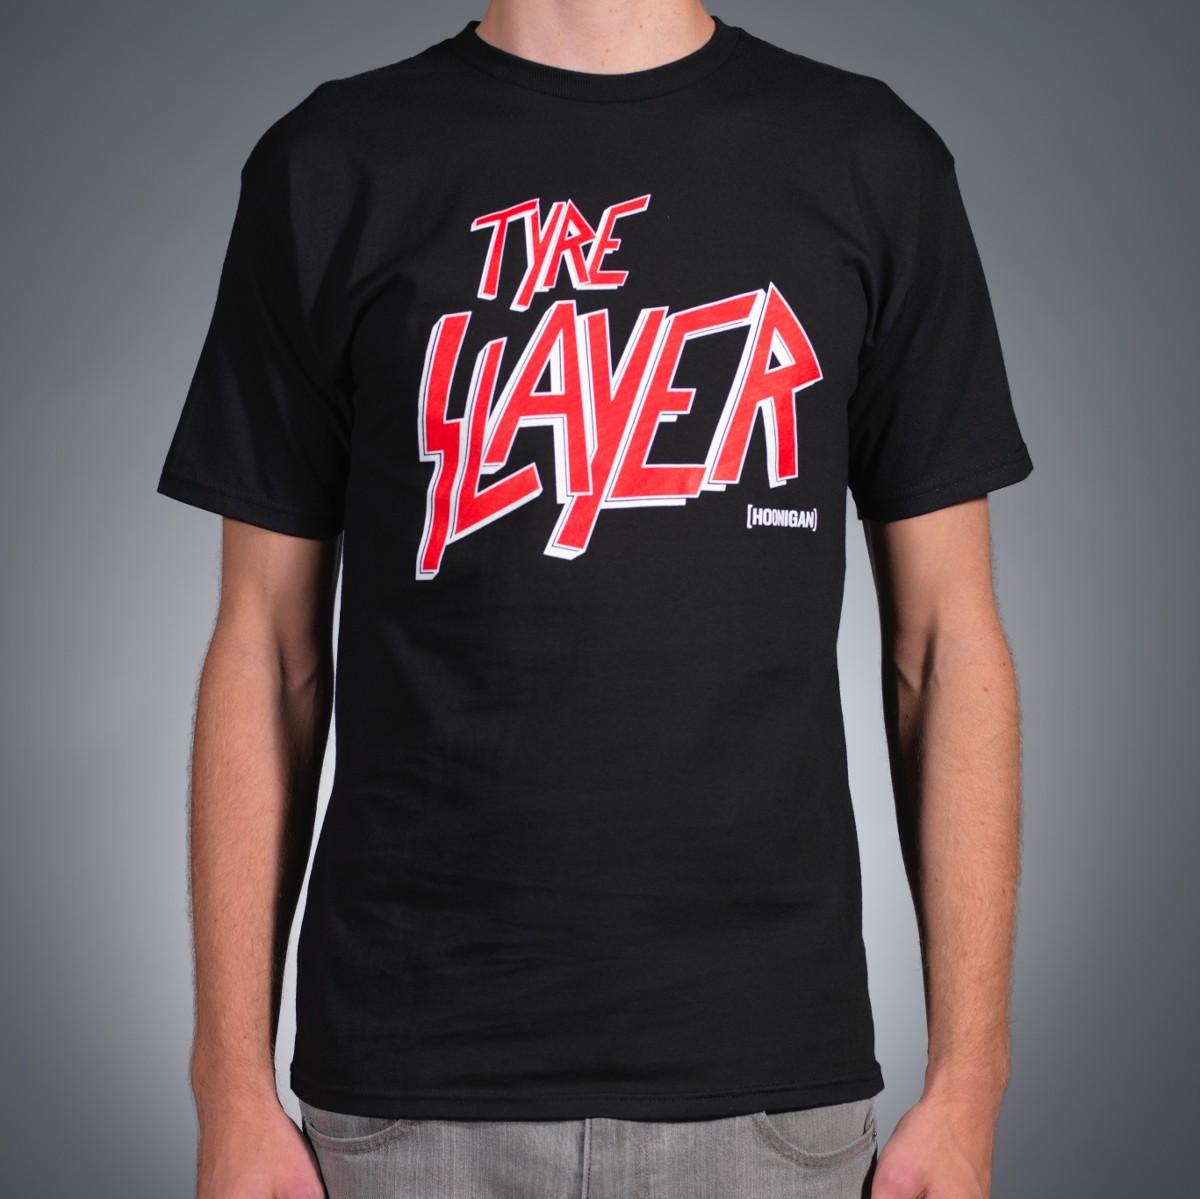 KenblockプロデュースのフーニガンレーシングデザインのTシャツです!<div>こちらは会員割引対象商品です!</div>